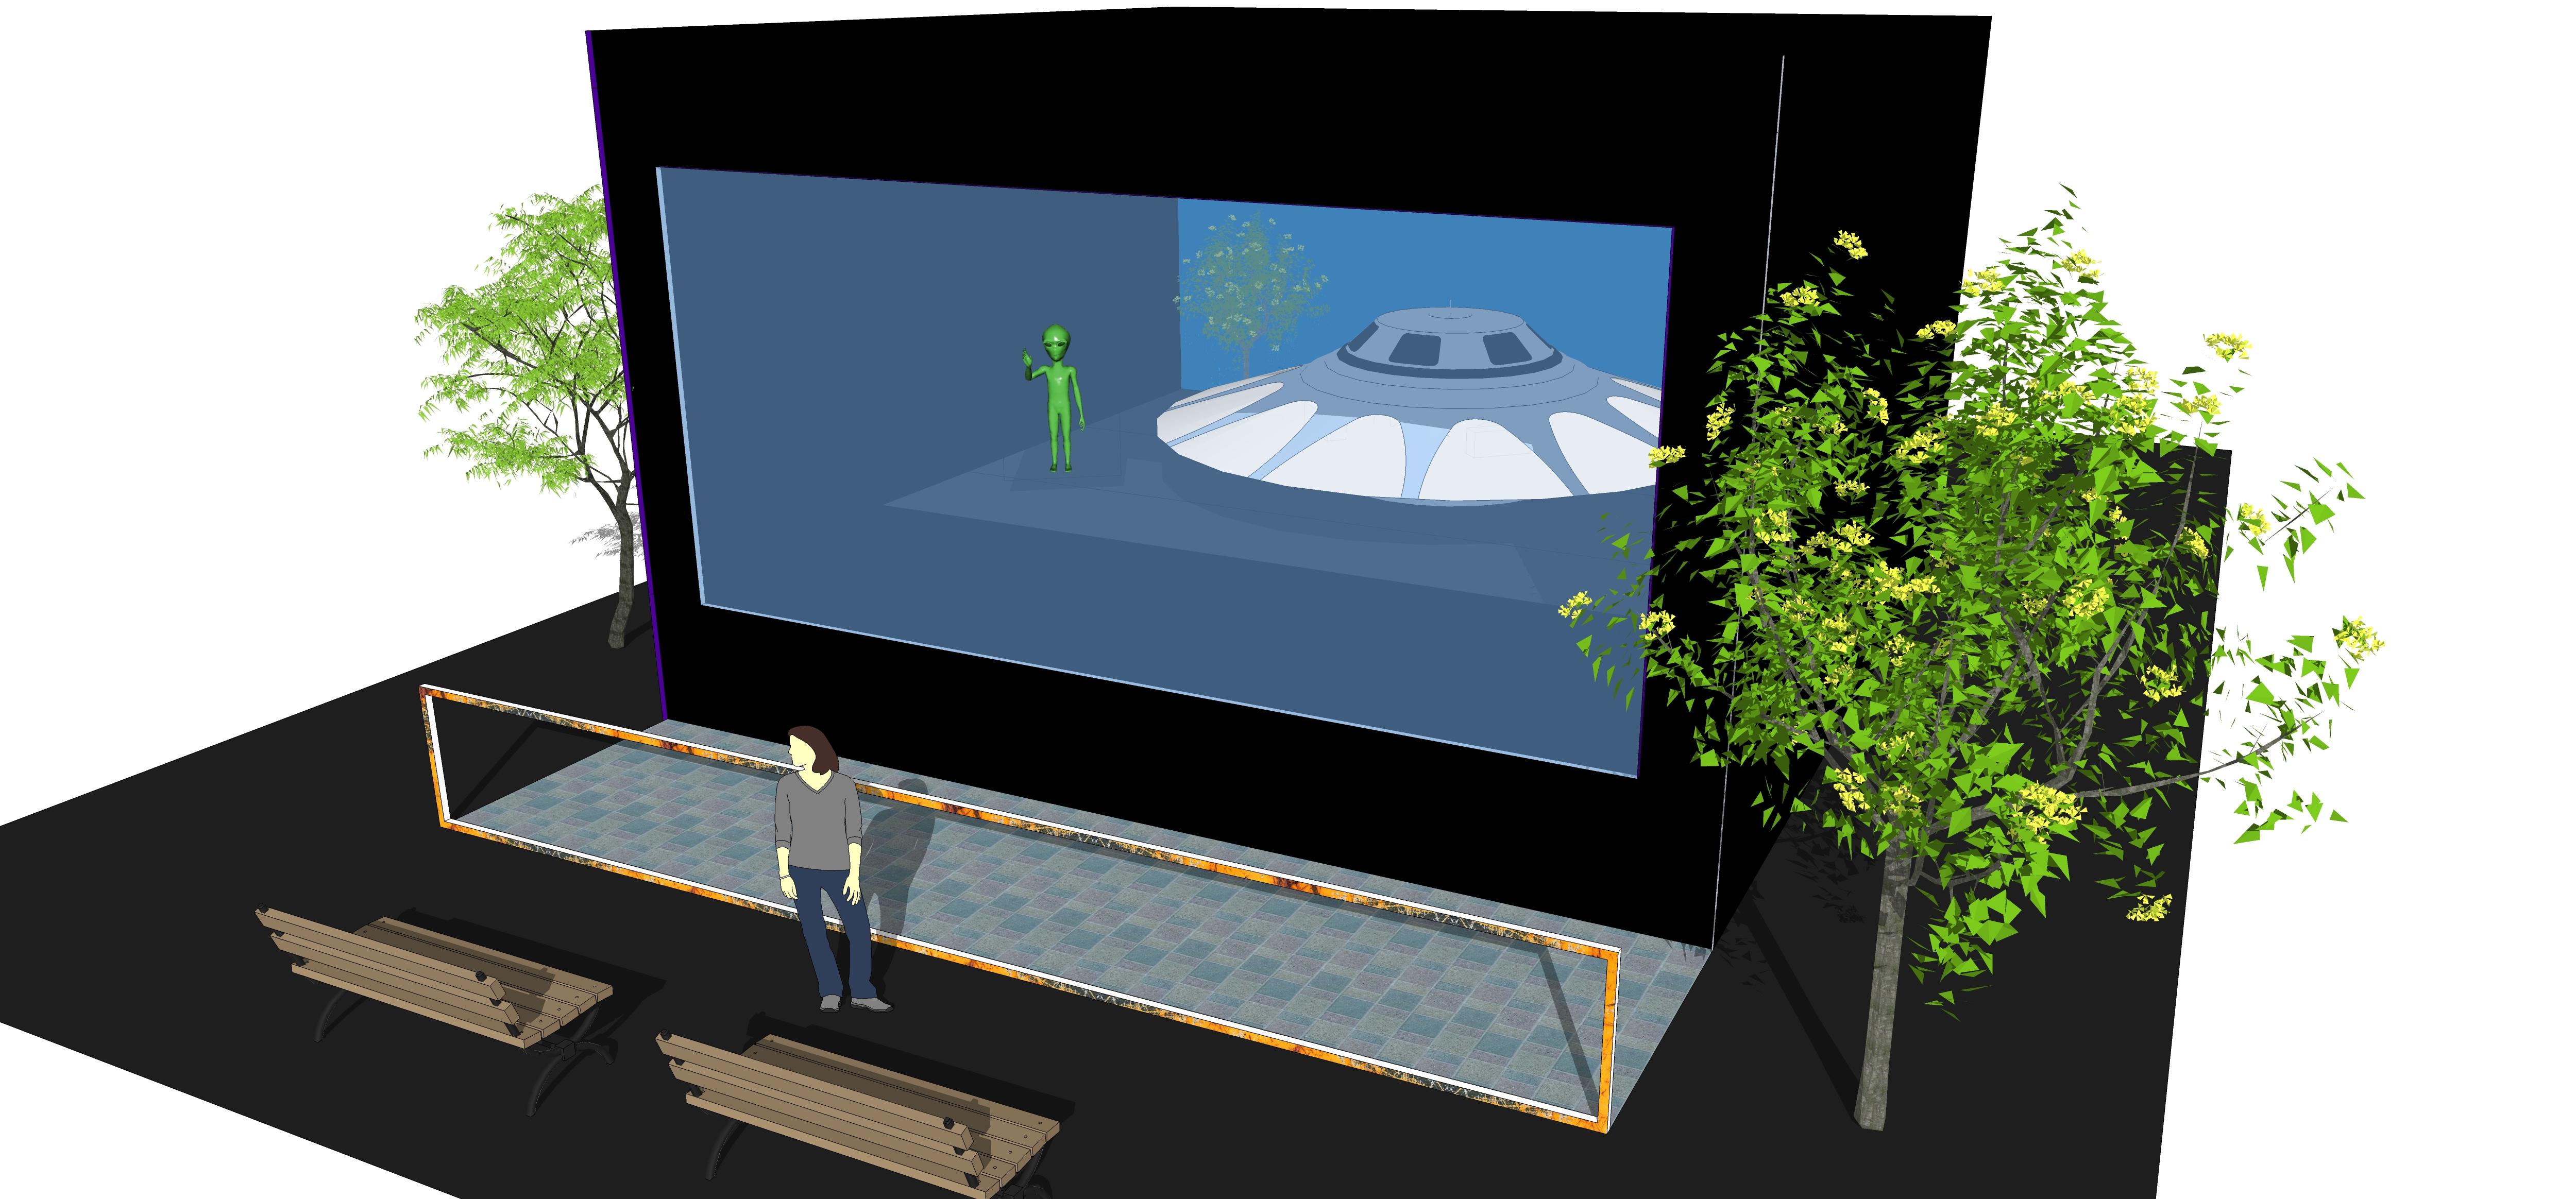 RC Jades Theater Holograms Setup SK 02651 – Rianfil